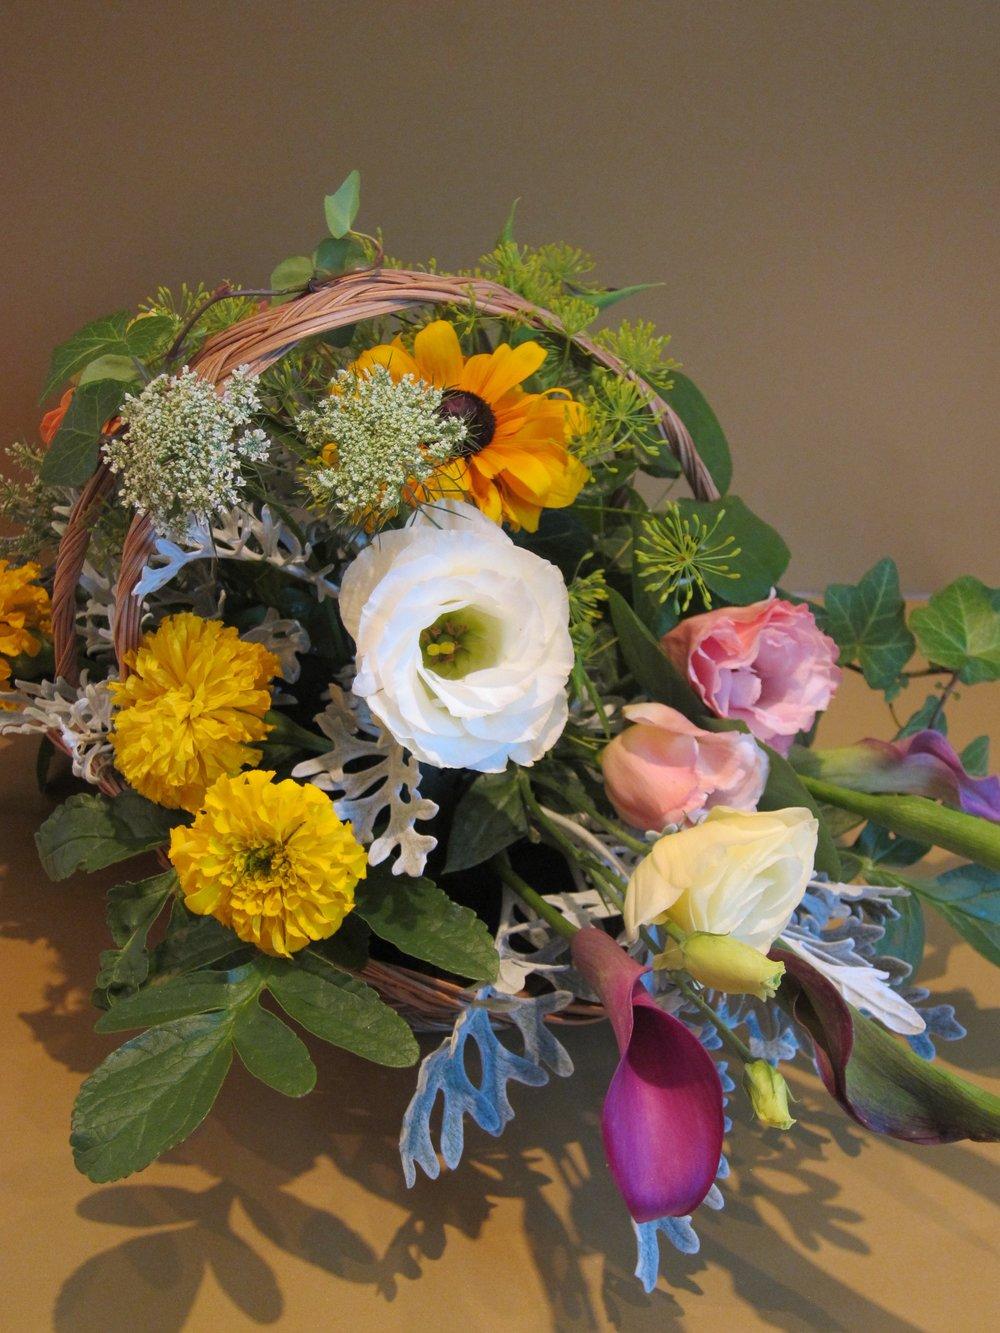 LOW BASKET Seasonal flowers, $45.